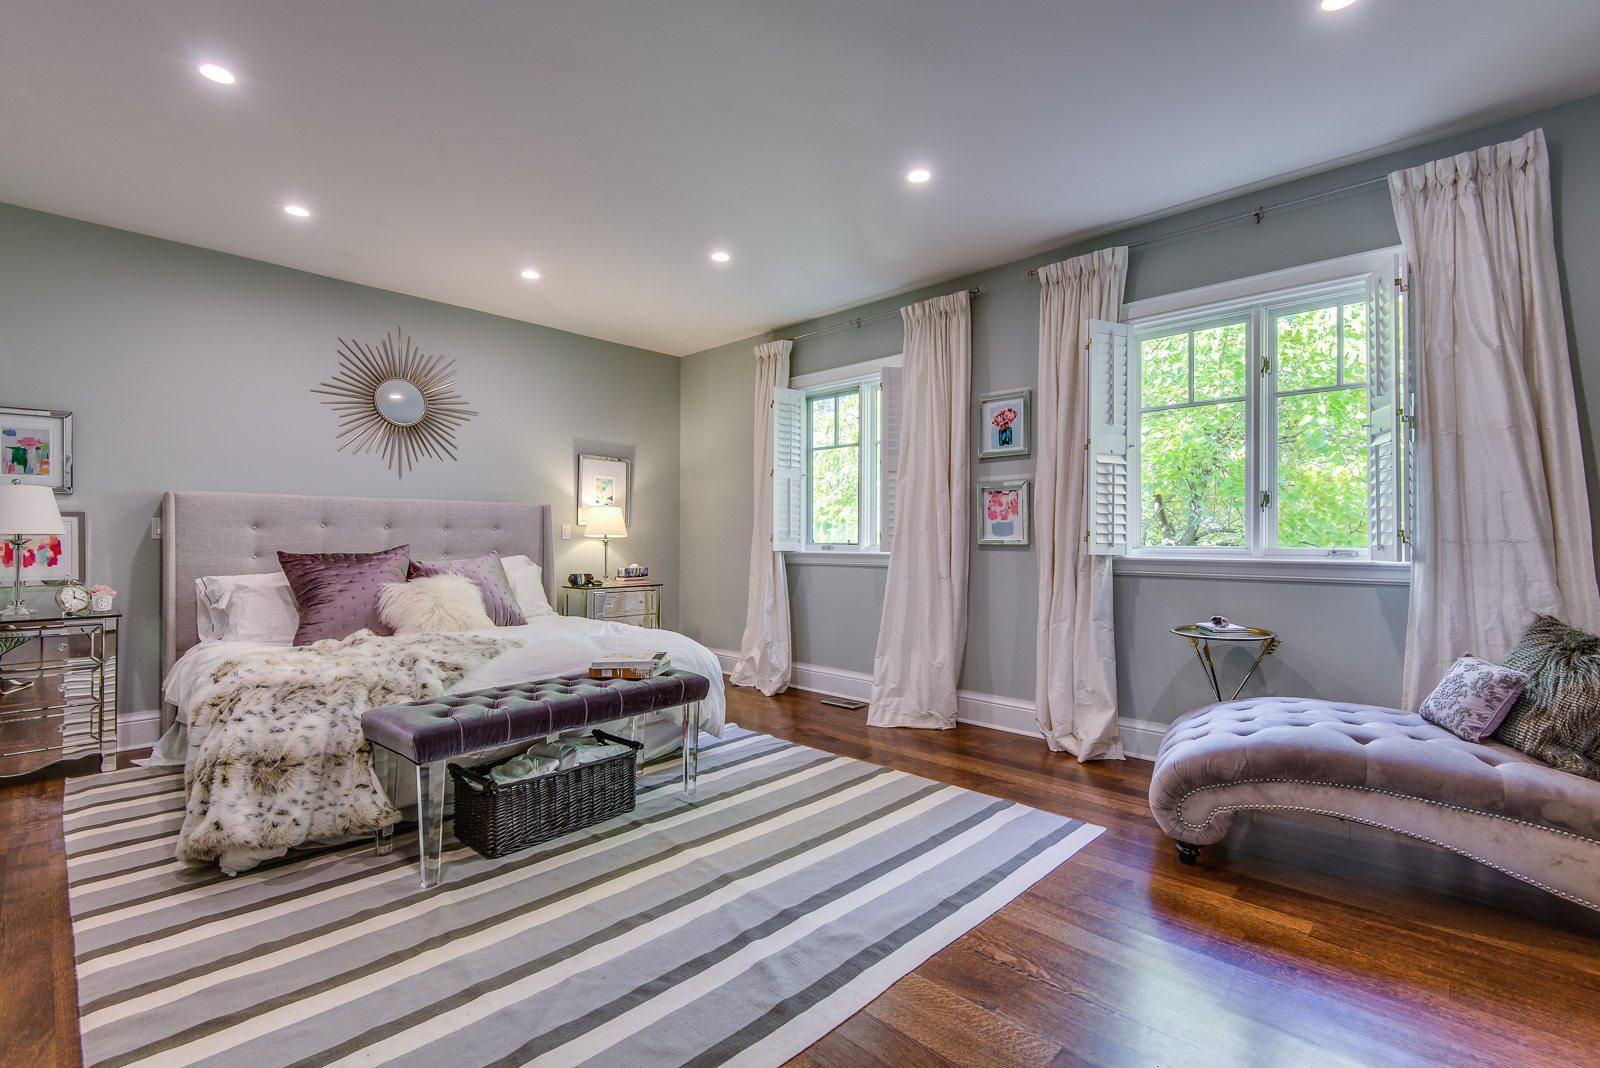 toronto-house-for-sale-38-springbank-avenue-14